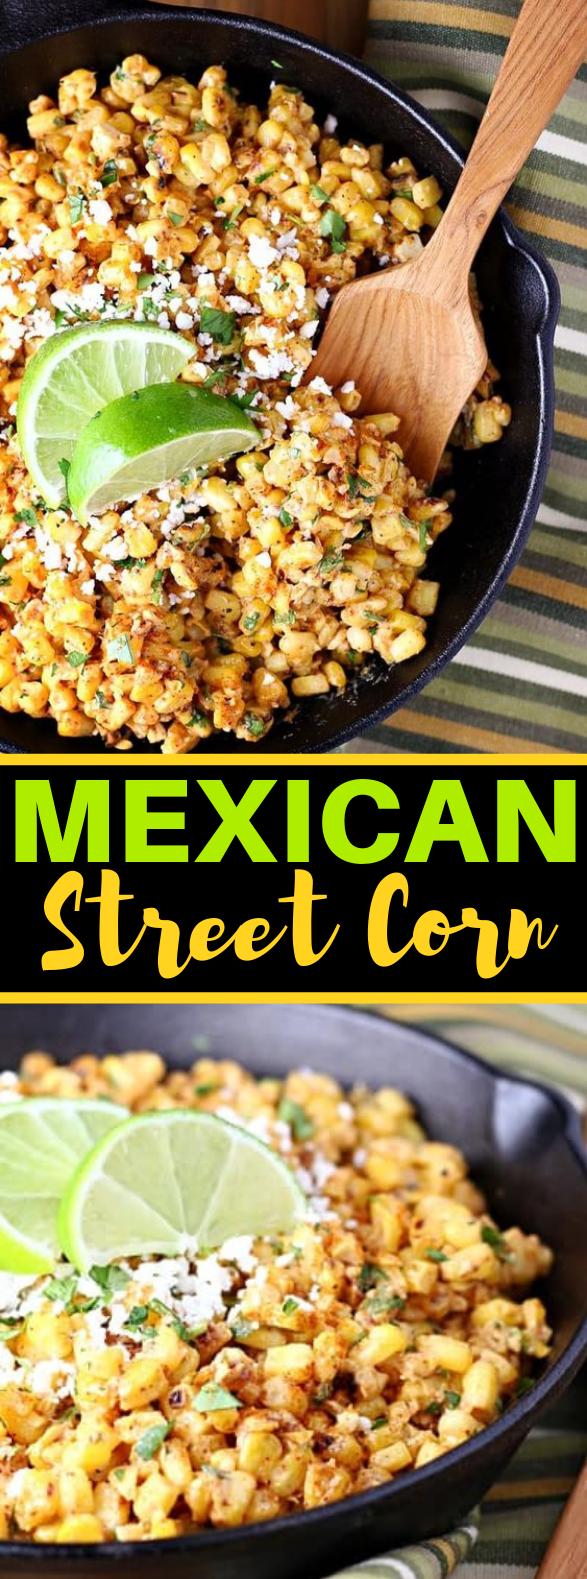 MEXICAN STREET CORN (TORCHY'S COPYCAT) #mexicanstreetcorn